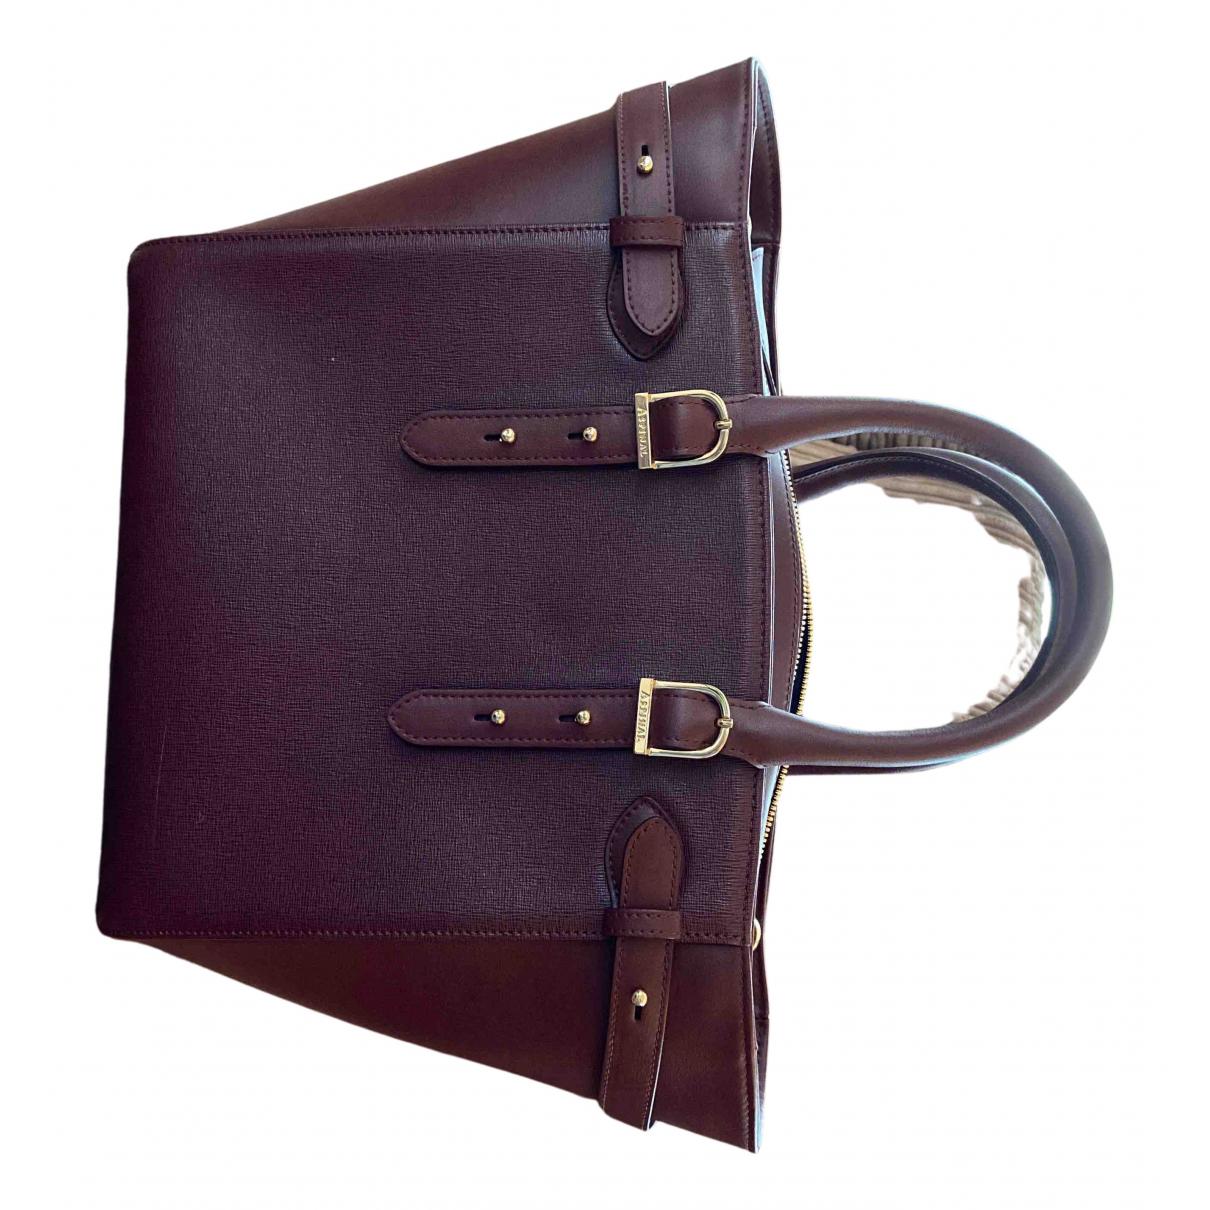 Aspinal Of London N Burgundy Leather handbag for Women N